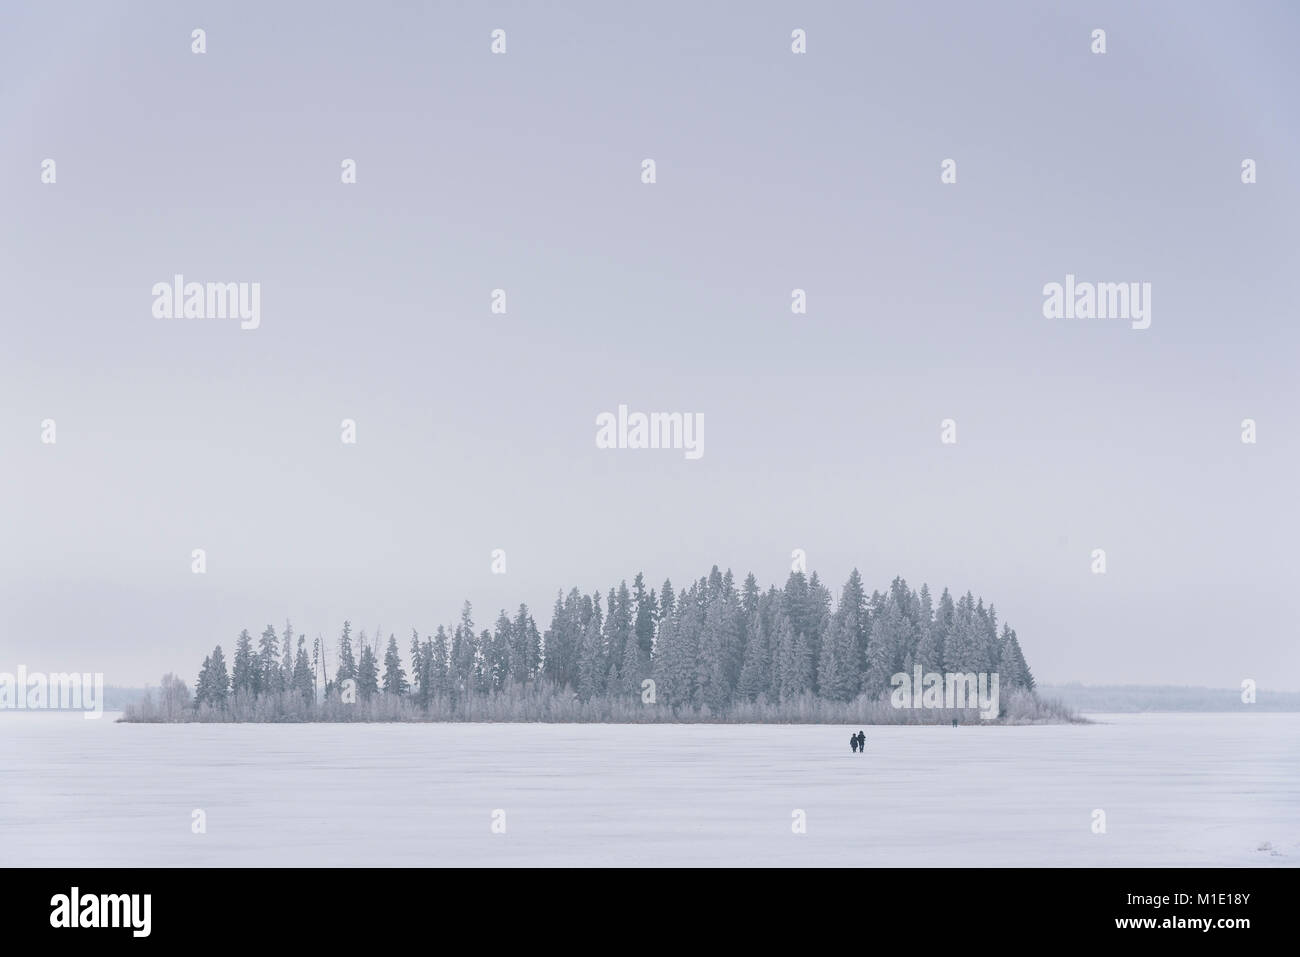 Couple walking on Astotin Lake, frozen winter landscape, Elk Island National Park, Alberta, Canada - Stock Image